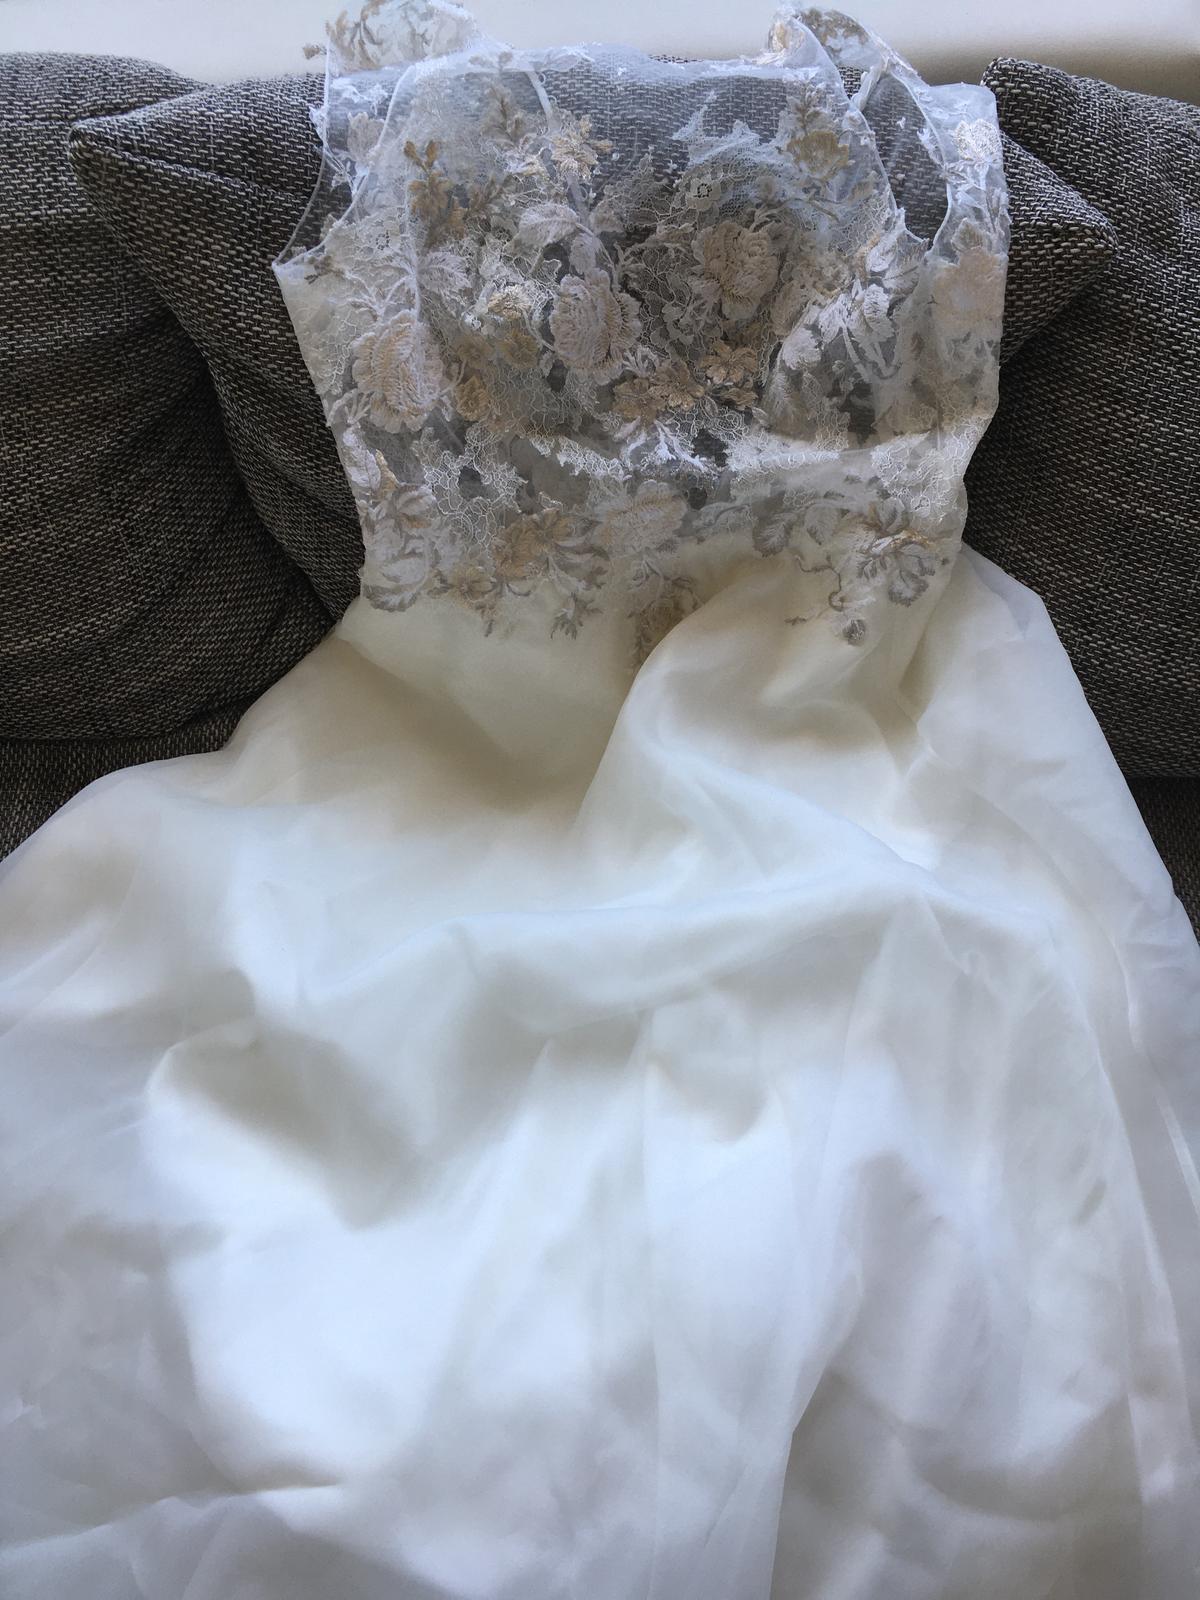 Svatebni saty s bohatou sukni - Obrázek č. 1